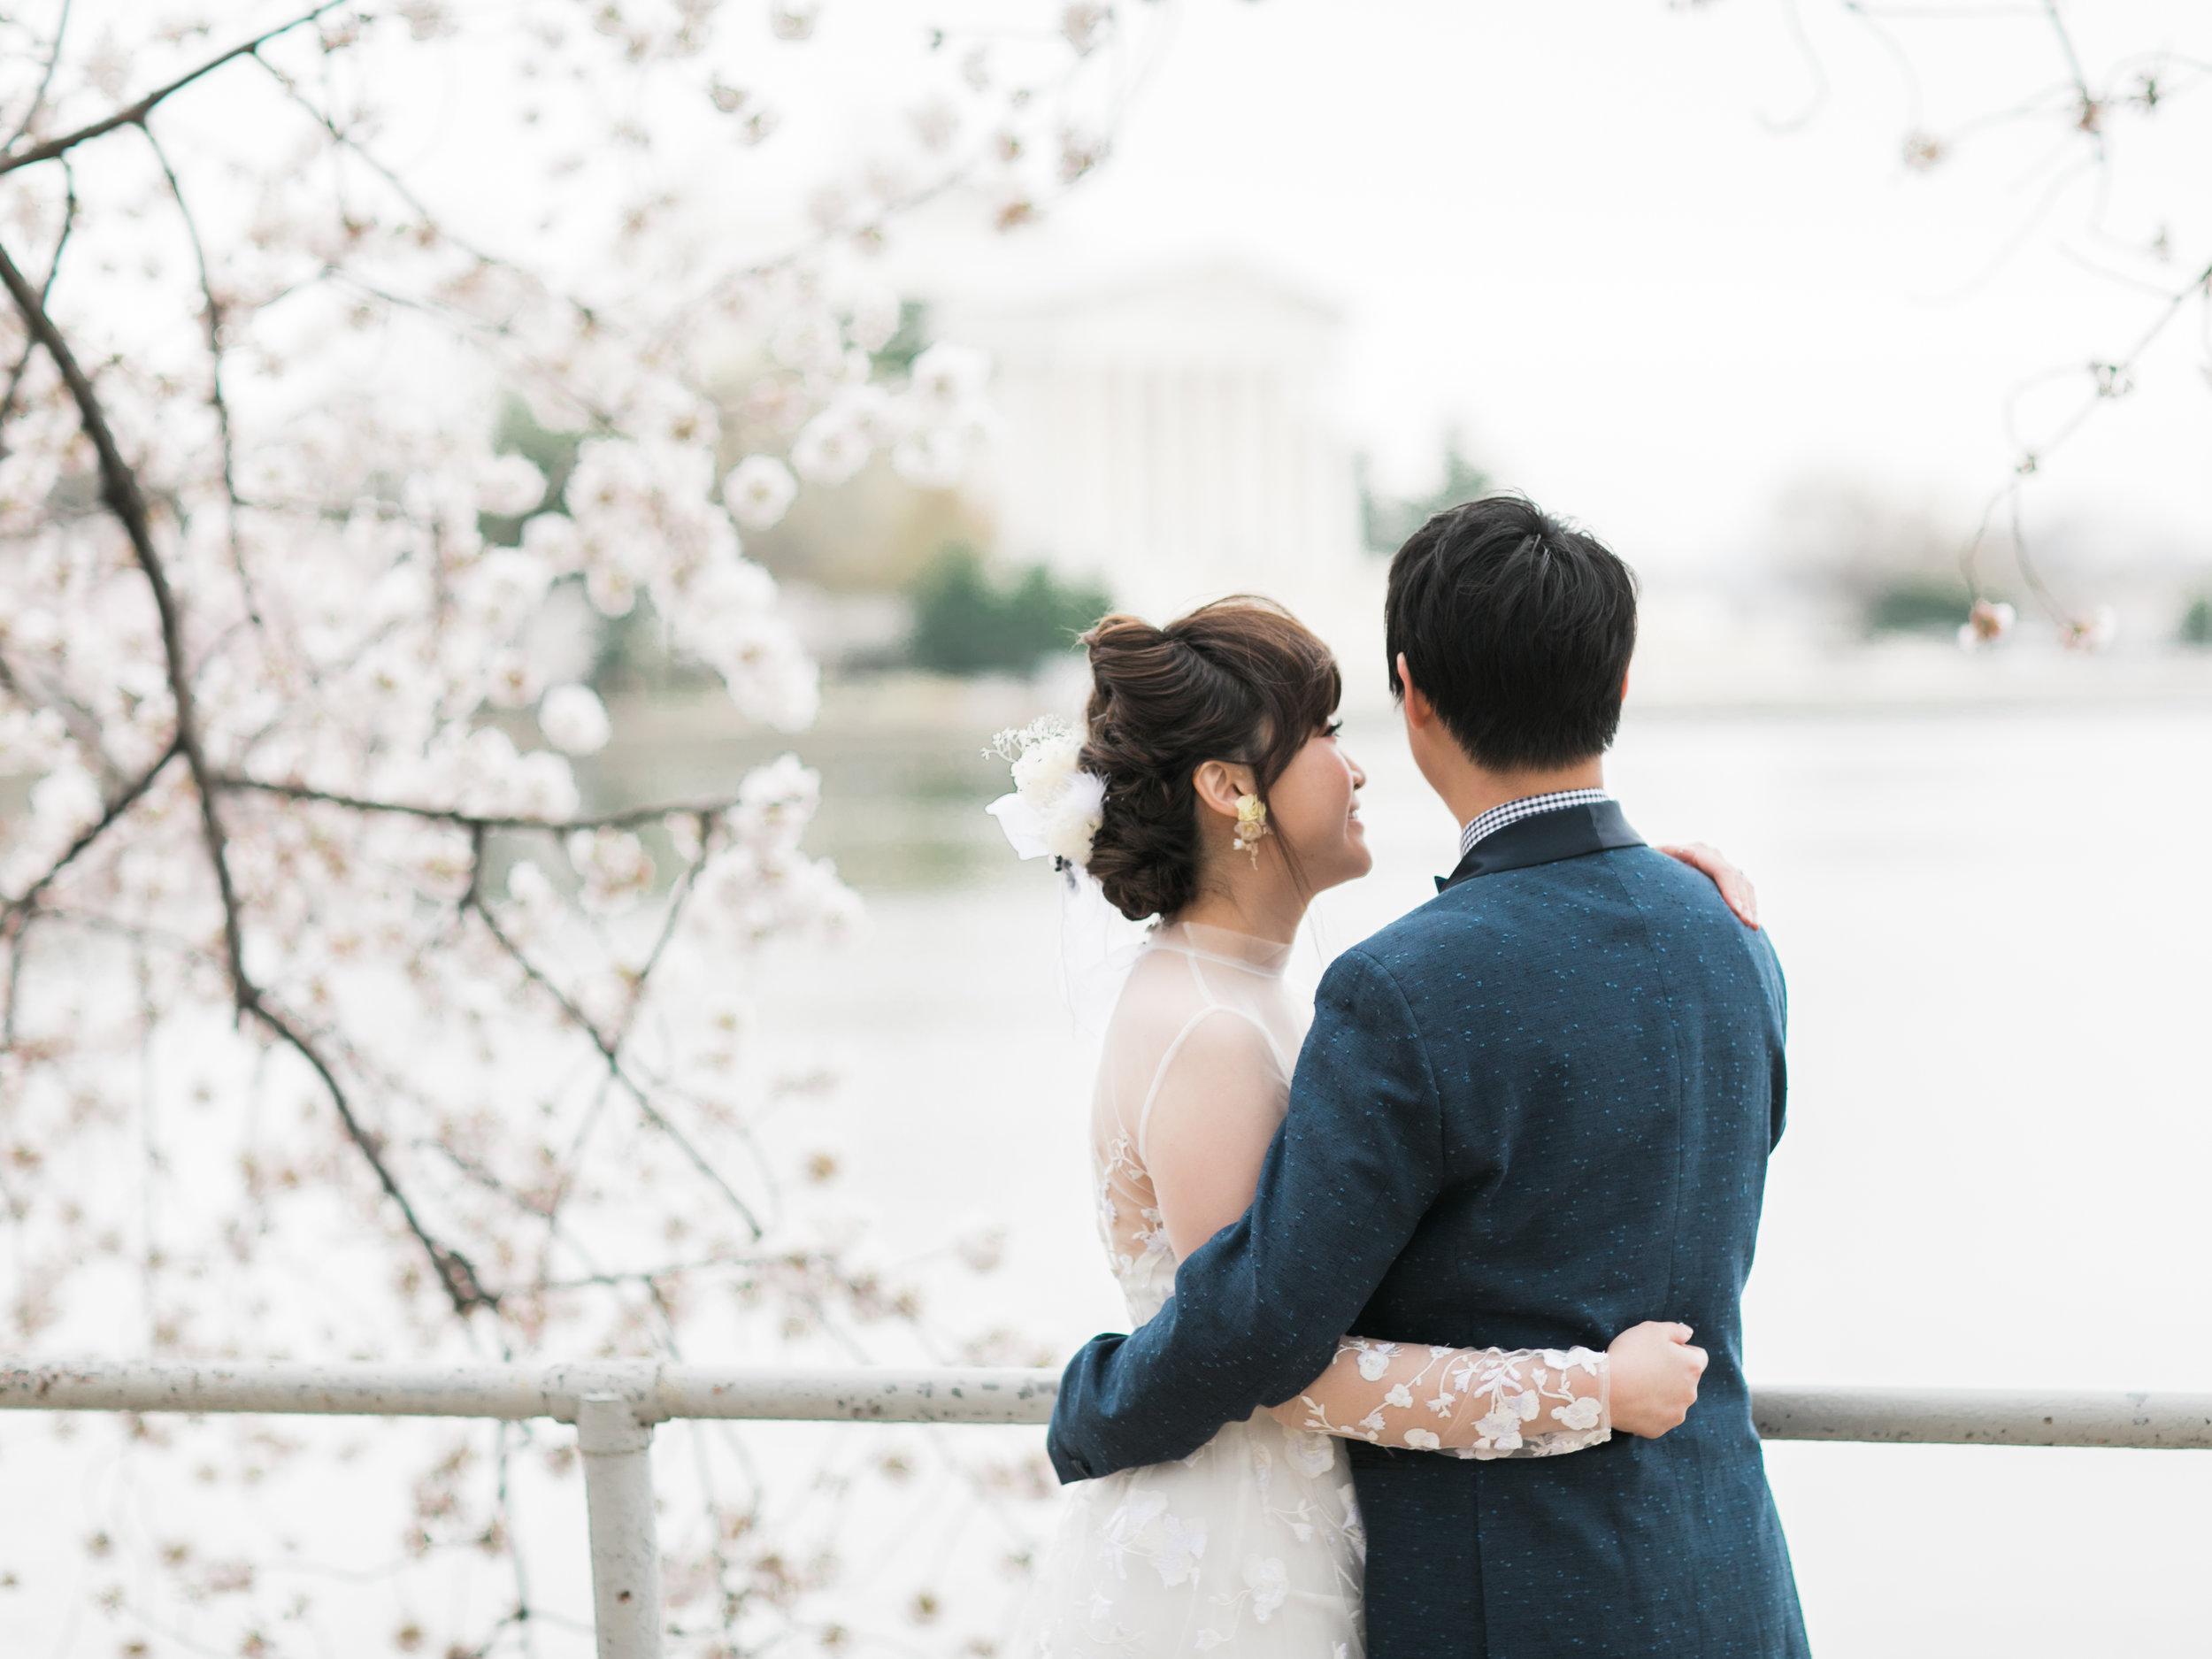 cherry-blossom-engagement-photos52.jpg